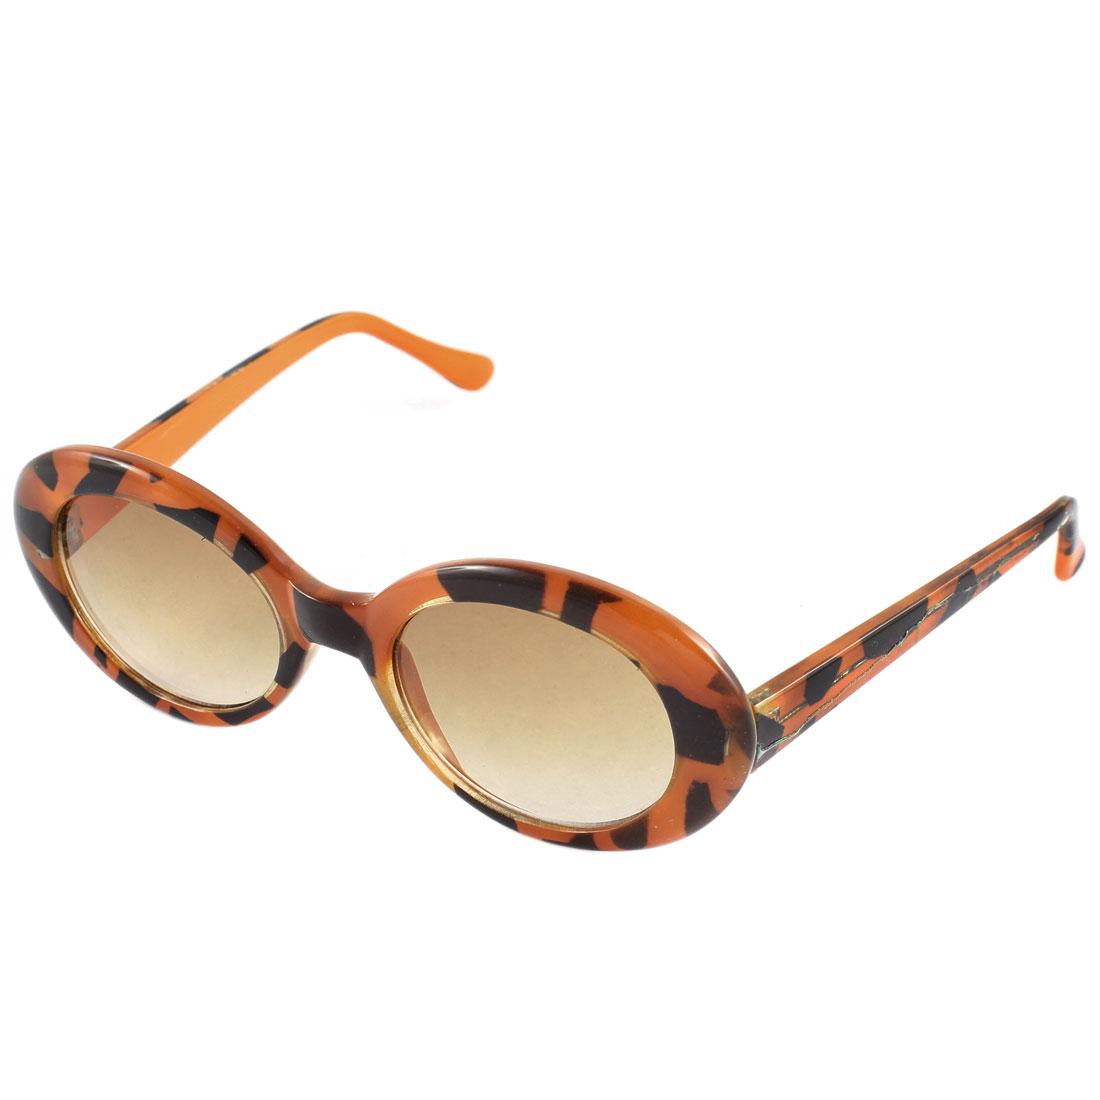 Retro Style Animal Pattern Frame Sunglasses Eyewear Orange Black